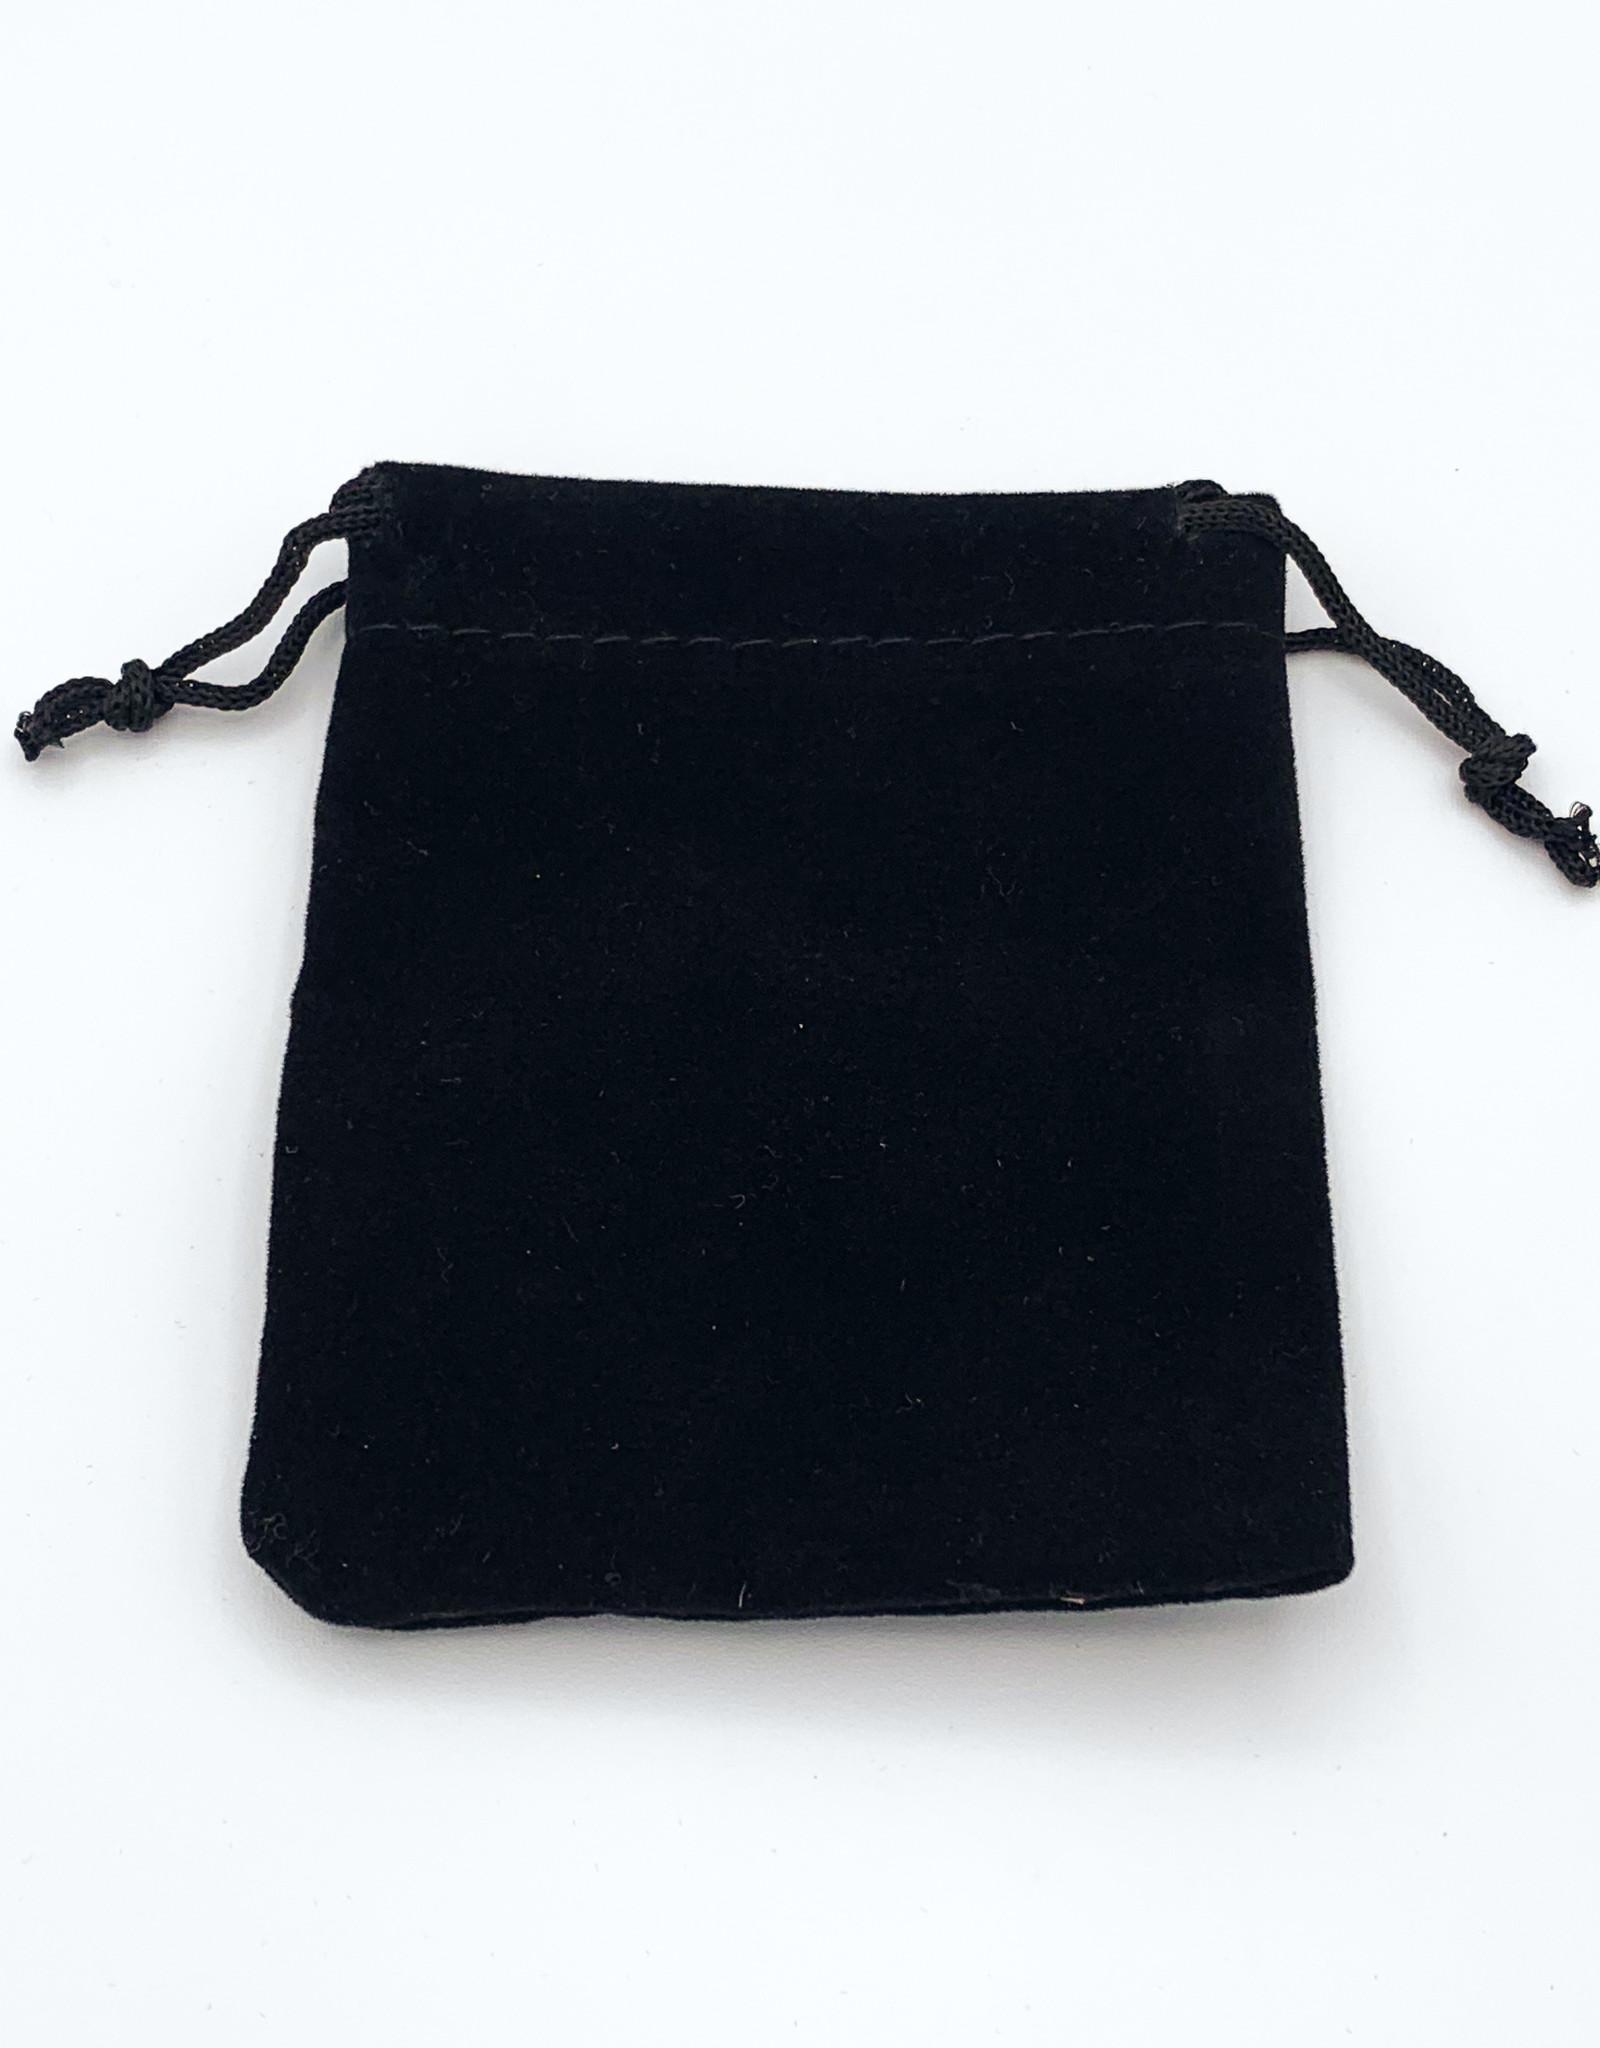 "Black 4x3"" Drawstring Pouch"